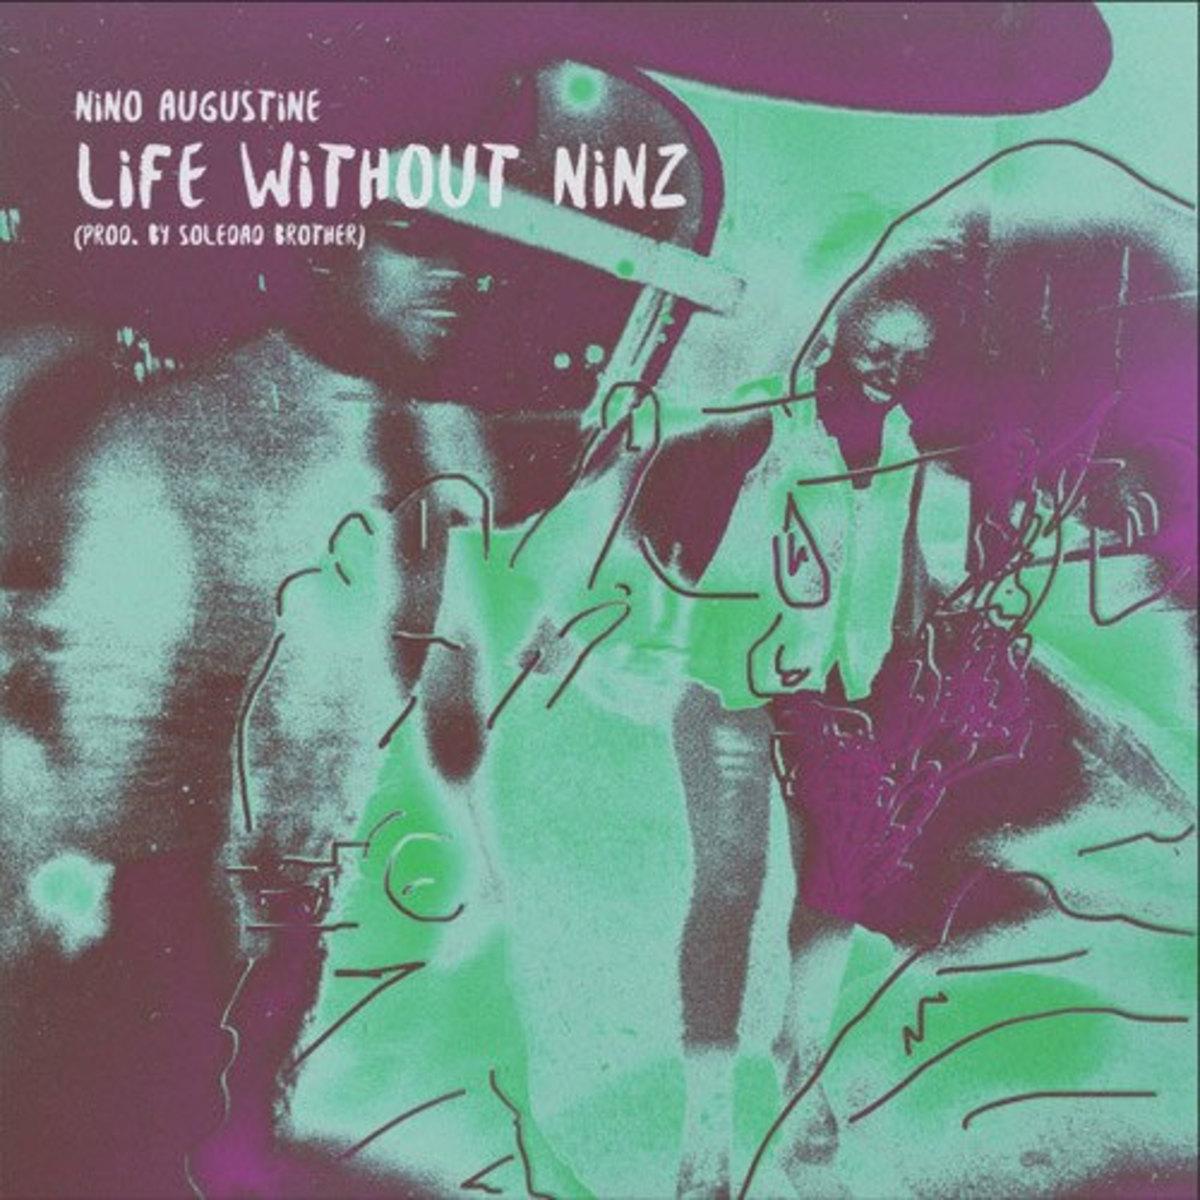 nino-augustine-life-without-ninz.jpg